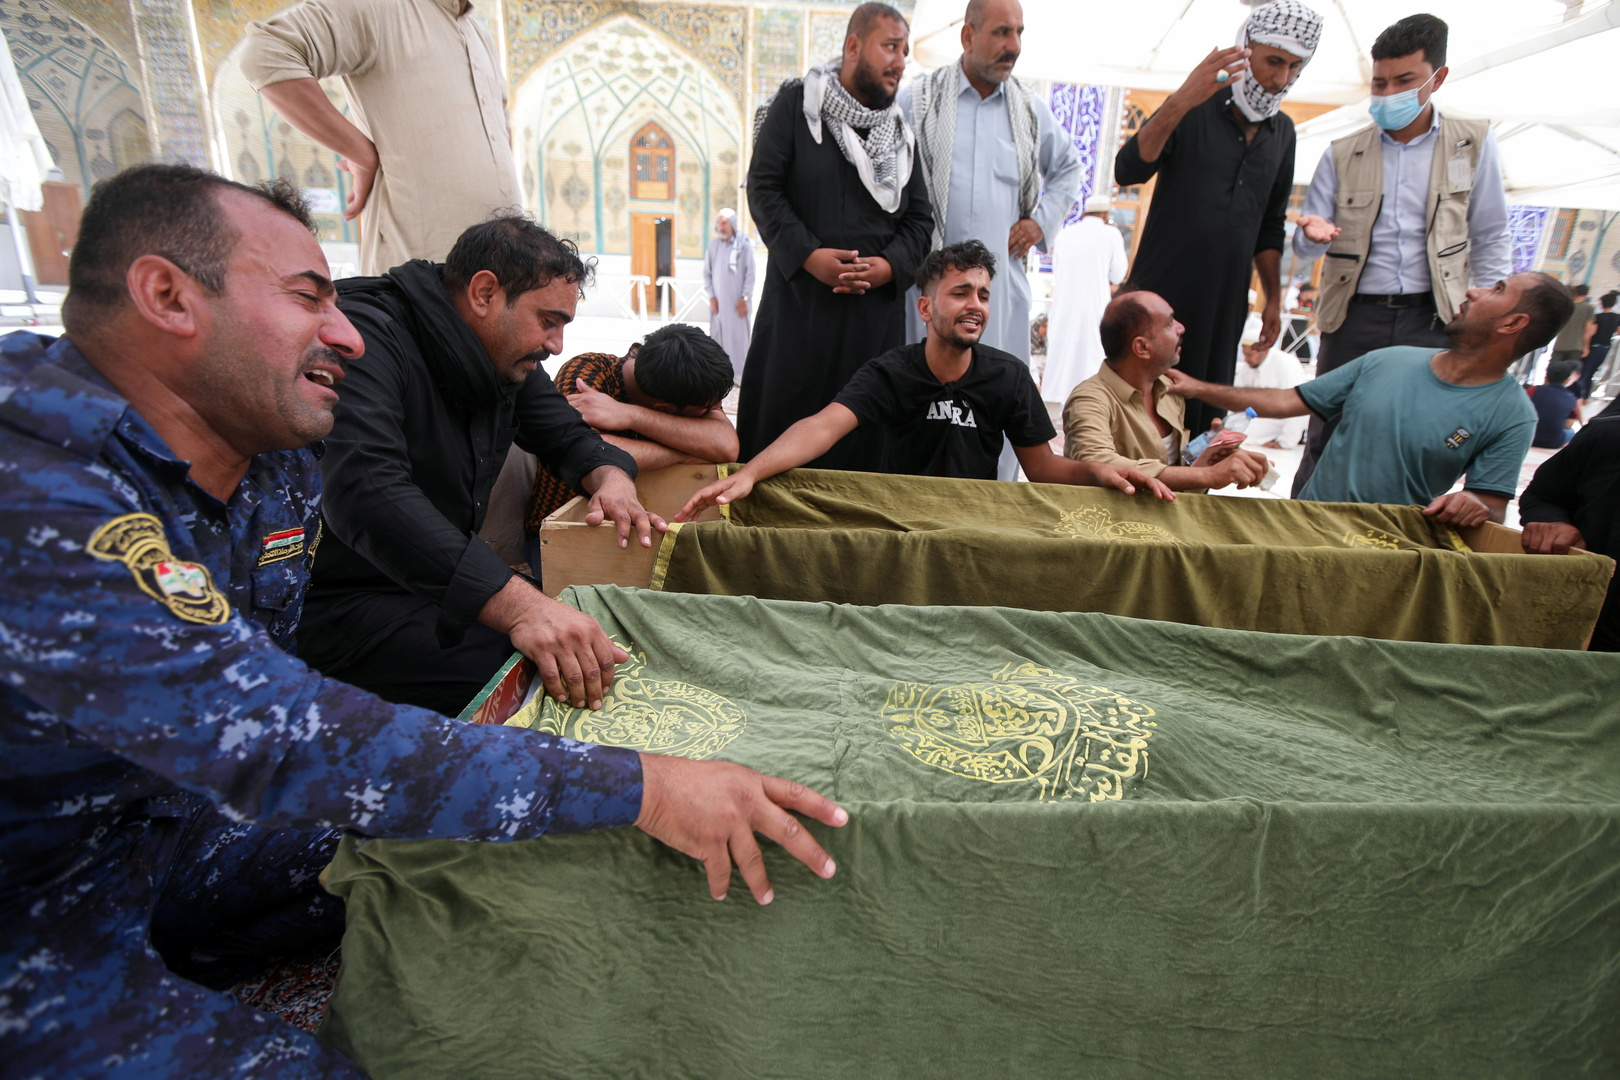 RT تنشر أسماء ضحايا حريق مستشفى الحسين في العراق: عشرات الجثث غير معروفة